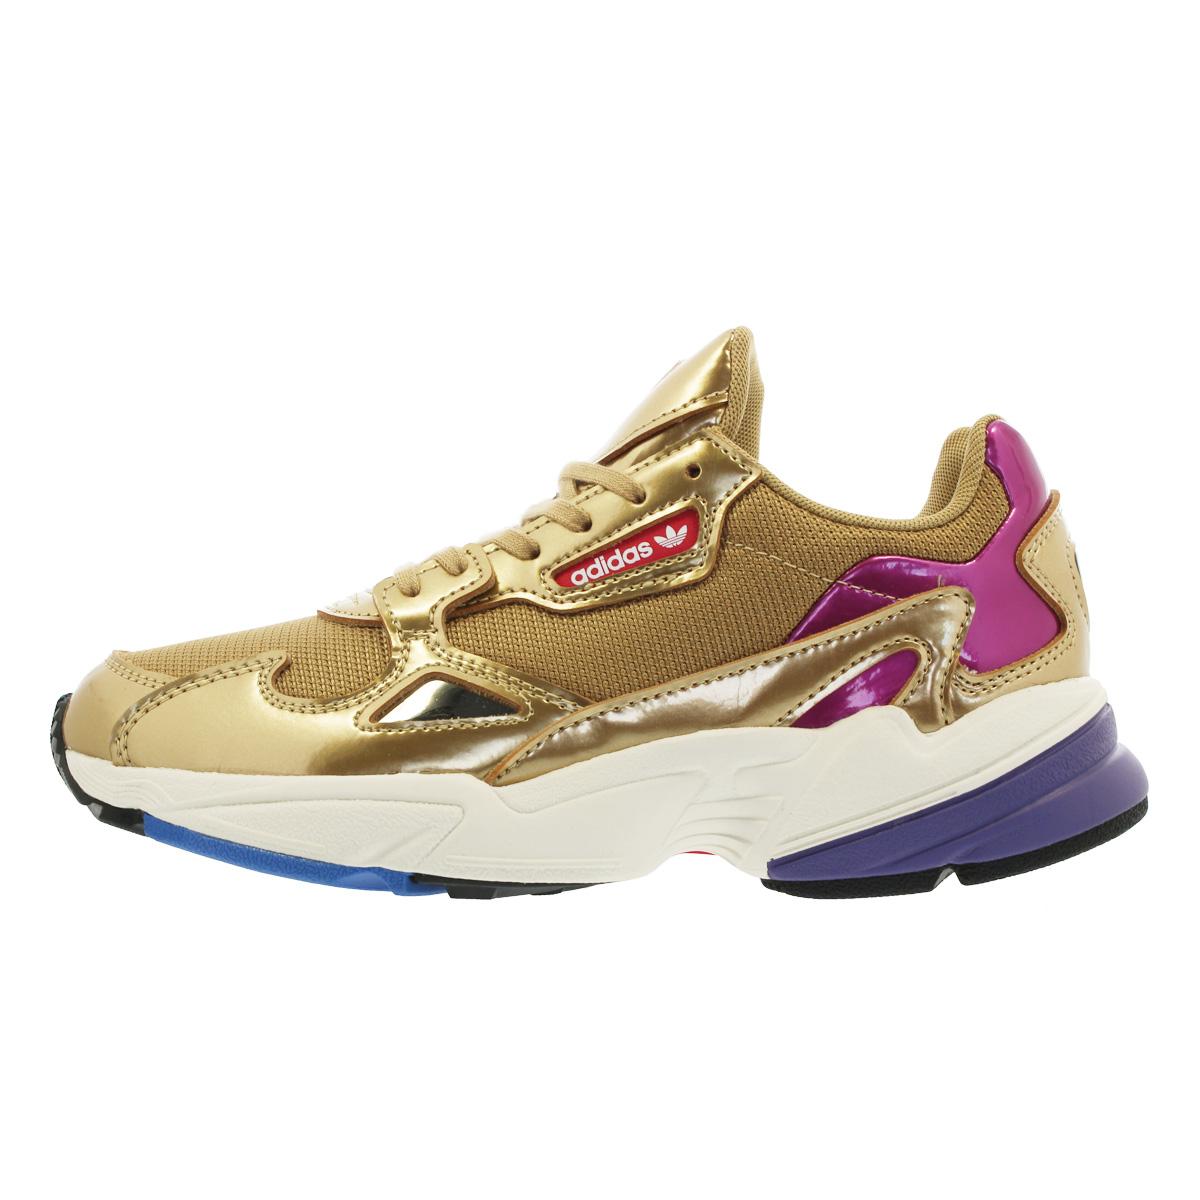 2783d4bbcdd adidas ADIDASFALCON W Adidas Adidas falcon women GOLD MET/GOLD MET/OFF  WHITE cg6247